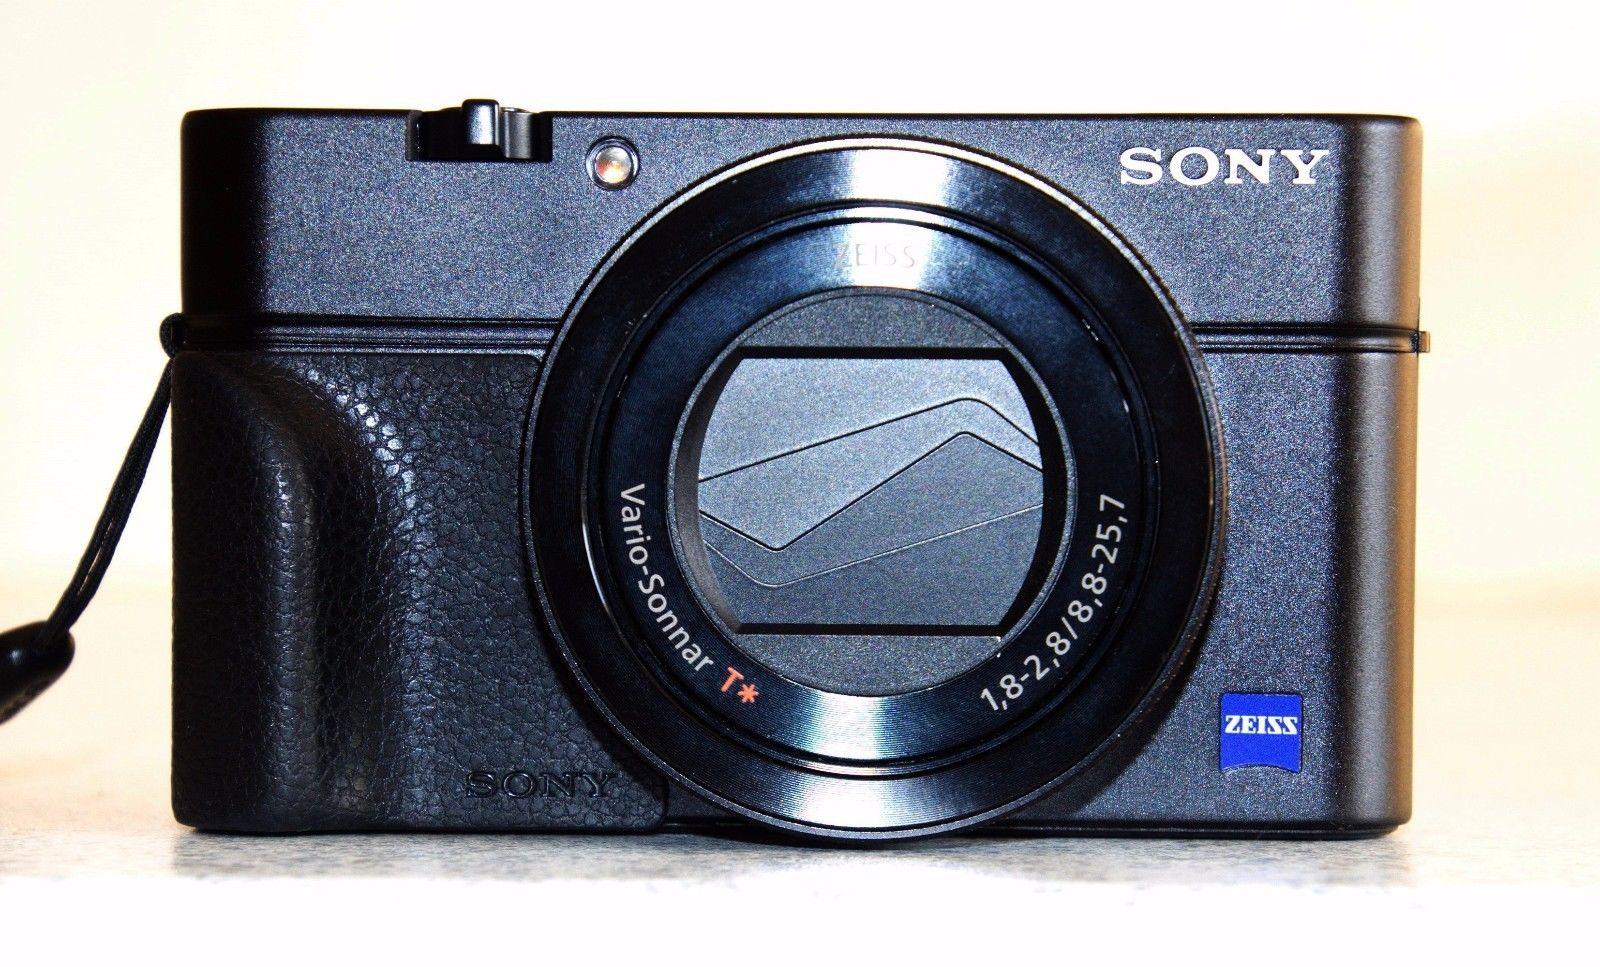 SONY RX100 IV, Cyber-Shot